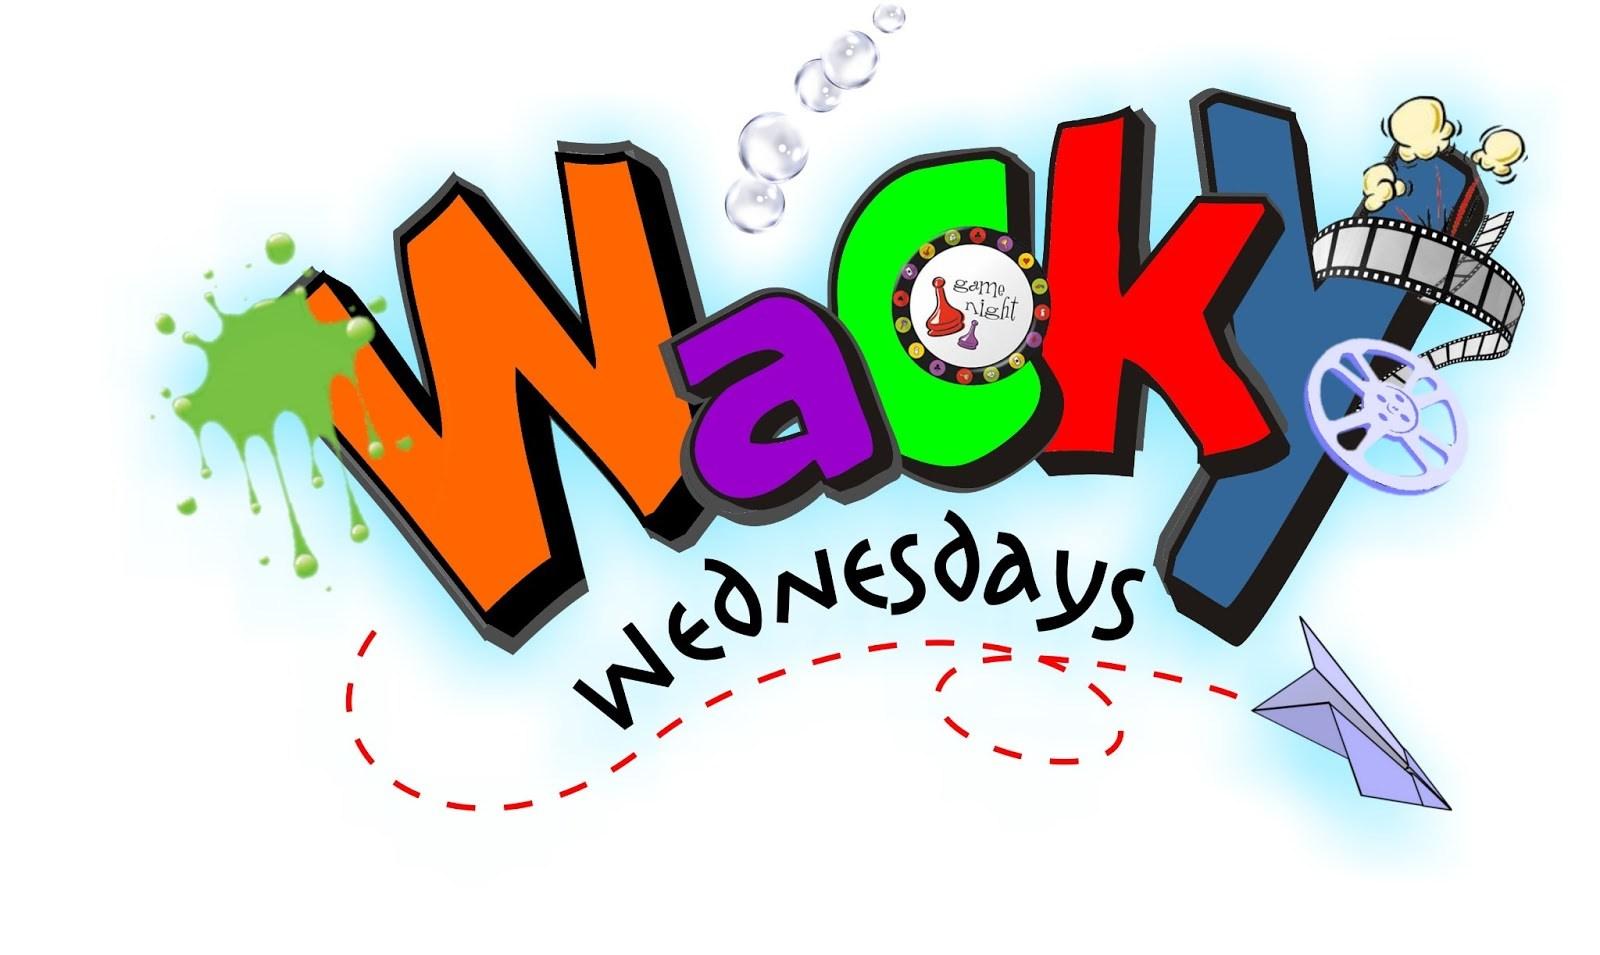 Wacky wednesday clipart 1 » Clipart Portal.